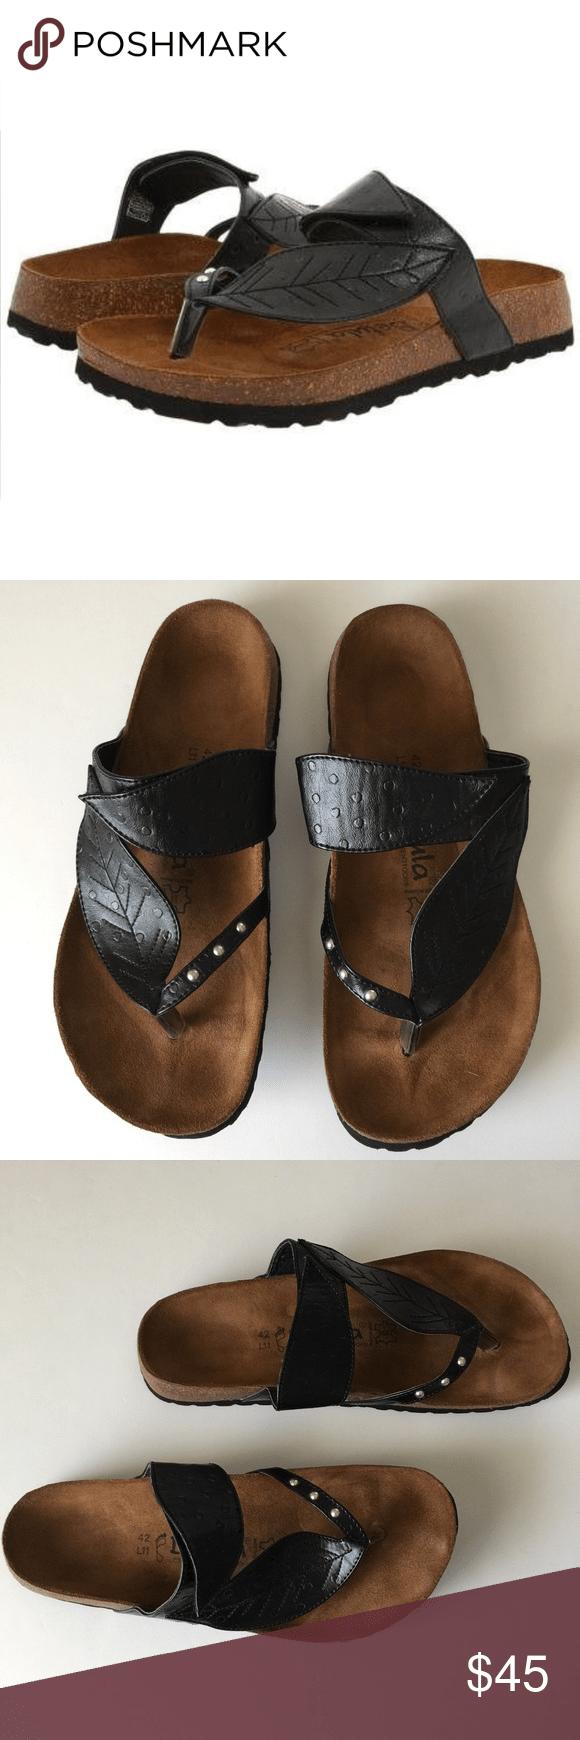 Birkenstock betula black bombay sandals size 11